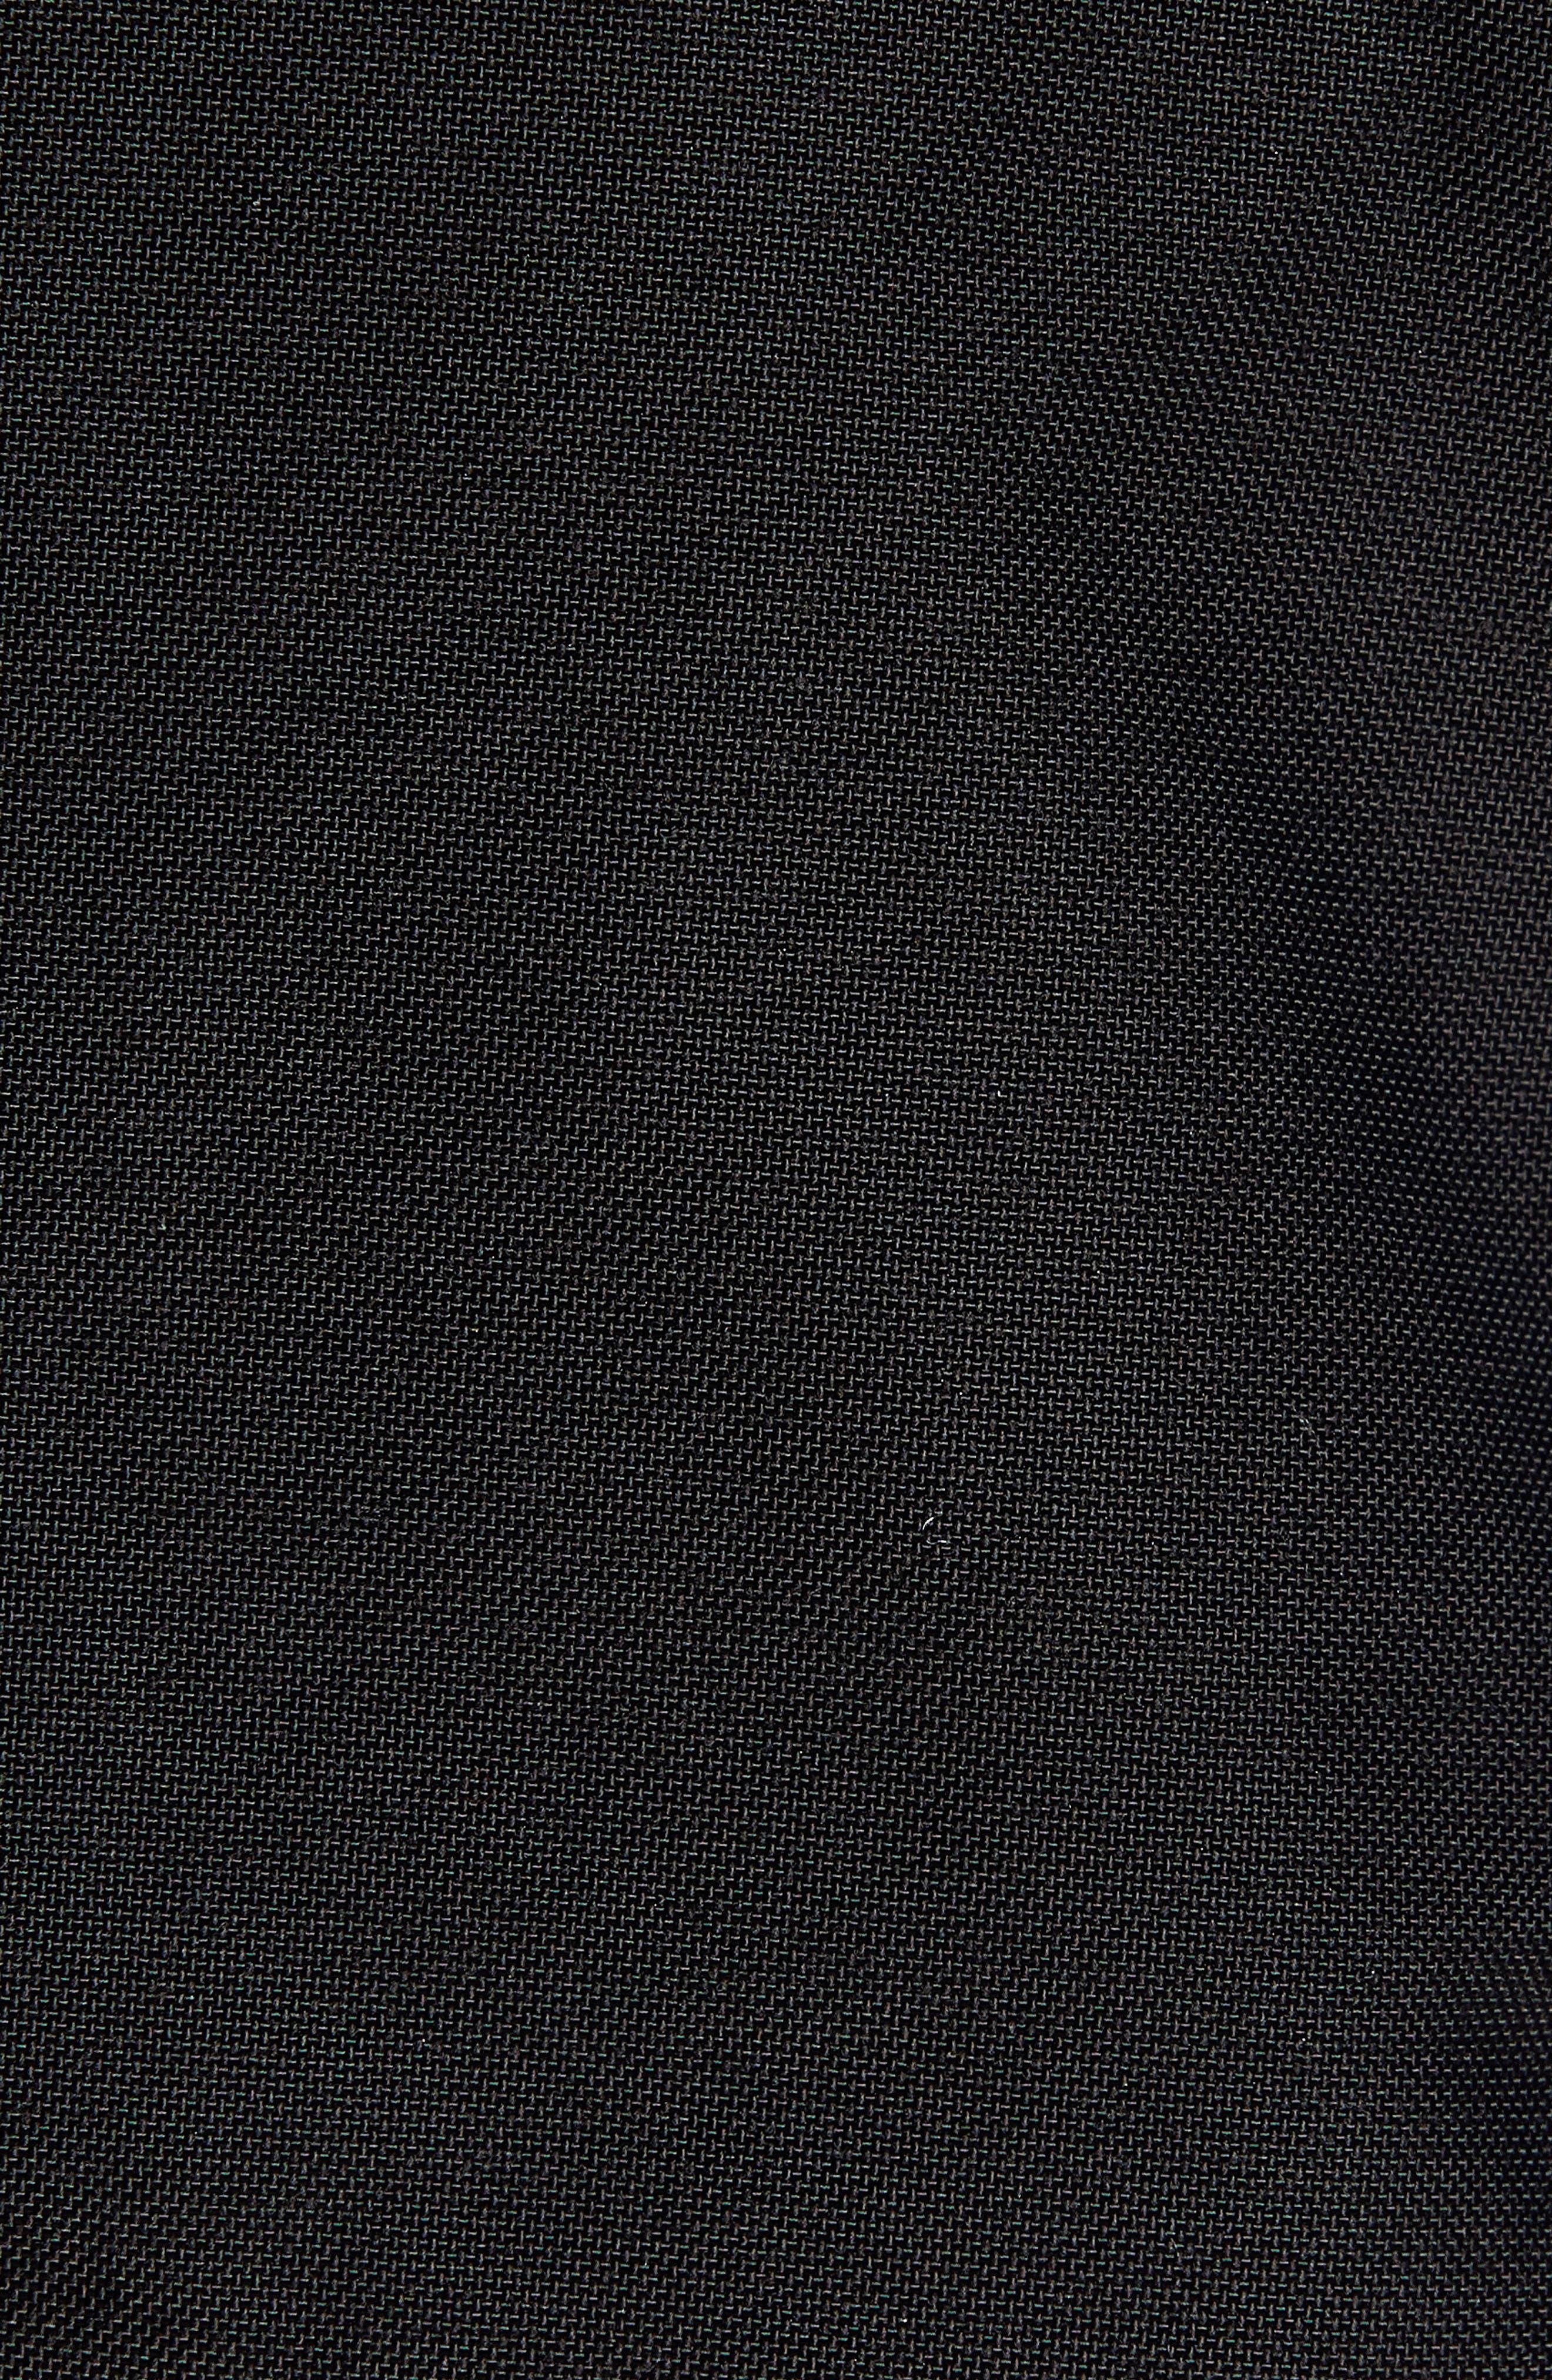 Mountain Jacket,                             Alternate thumbnail 6, color,                             001